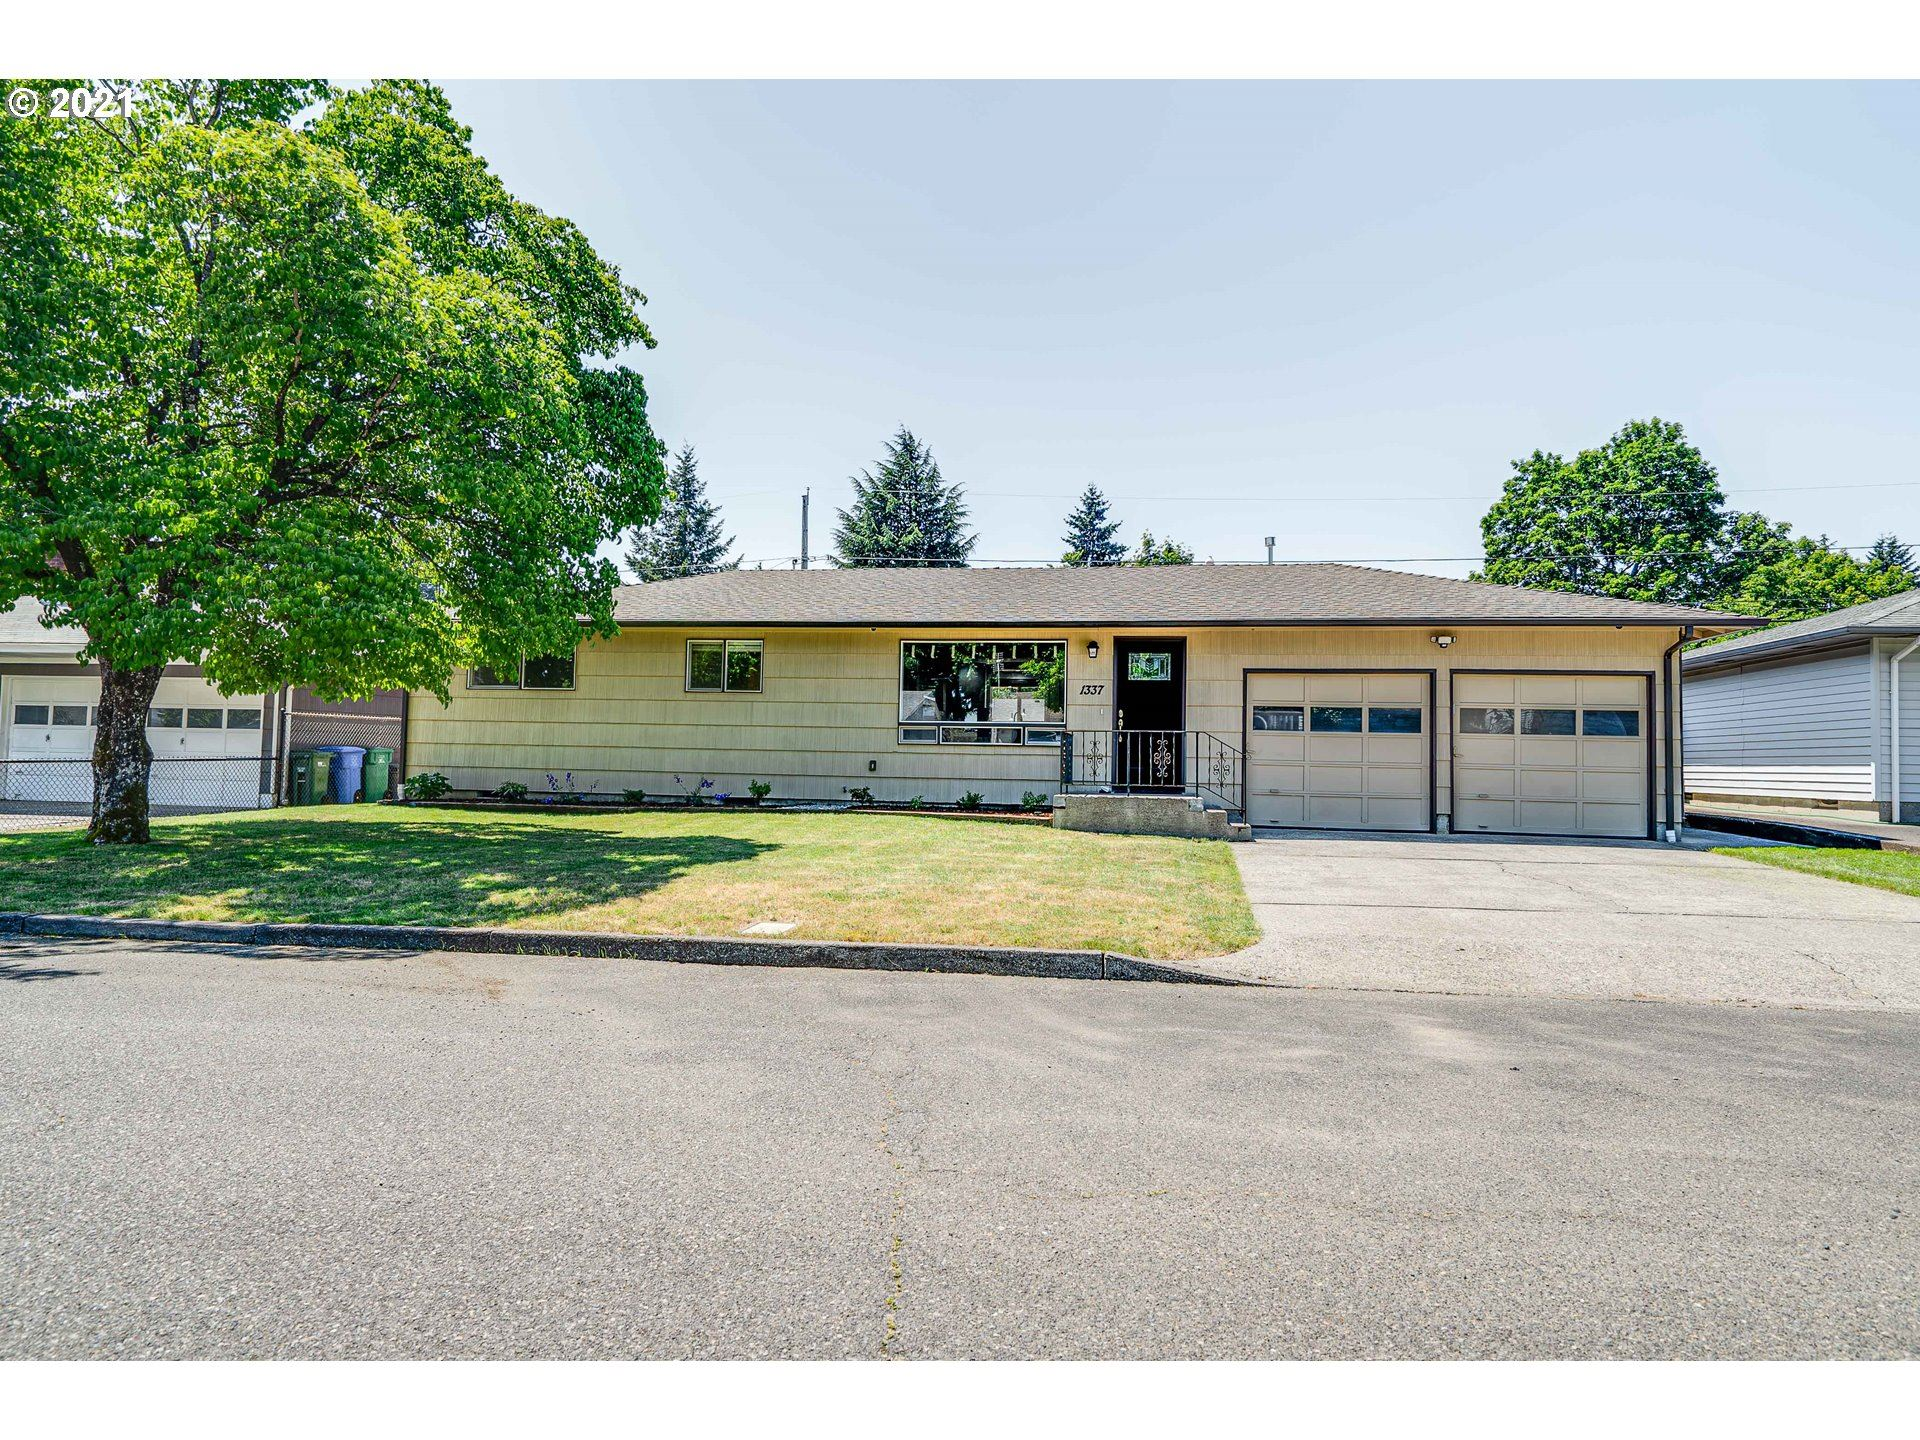 1337 SE 151ST AVE, Portland, OR 97233 - #: 21235223